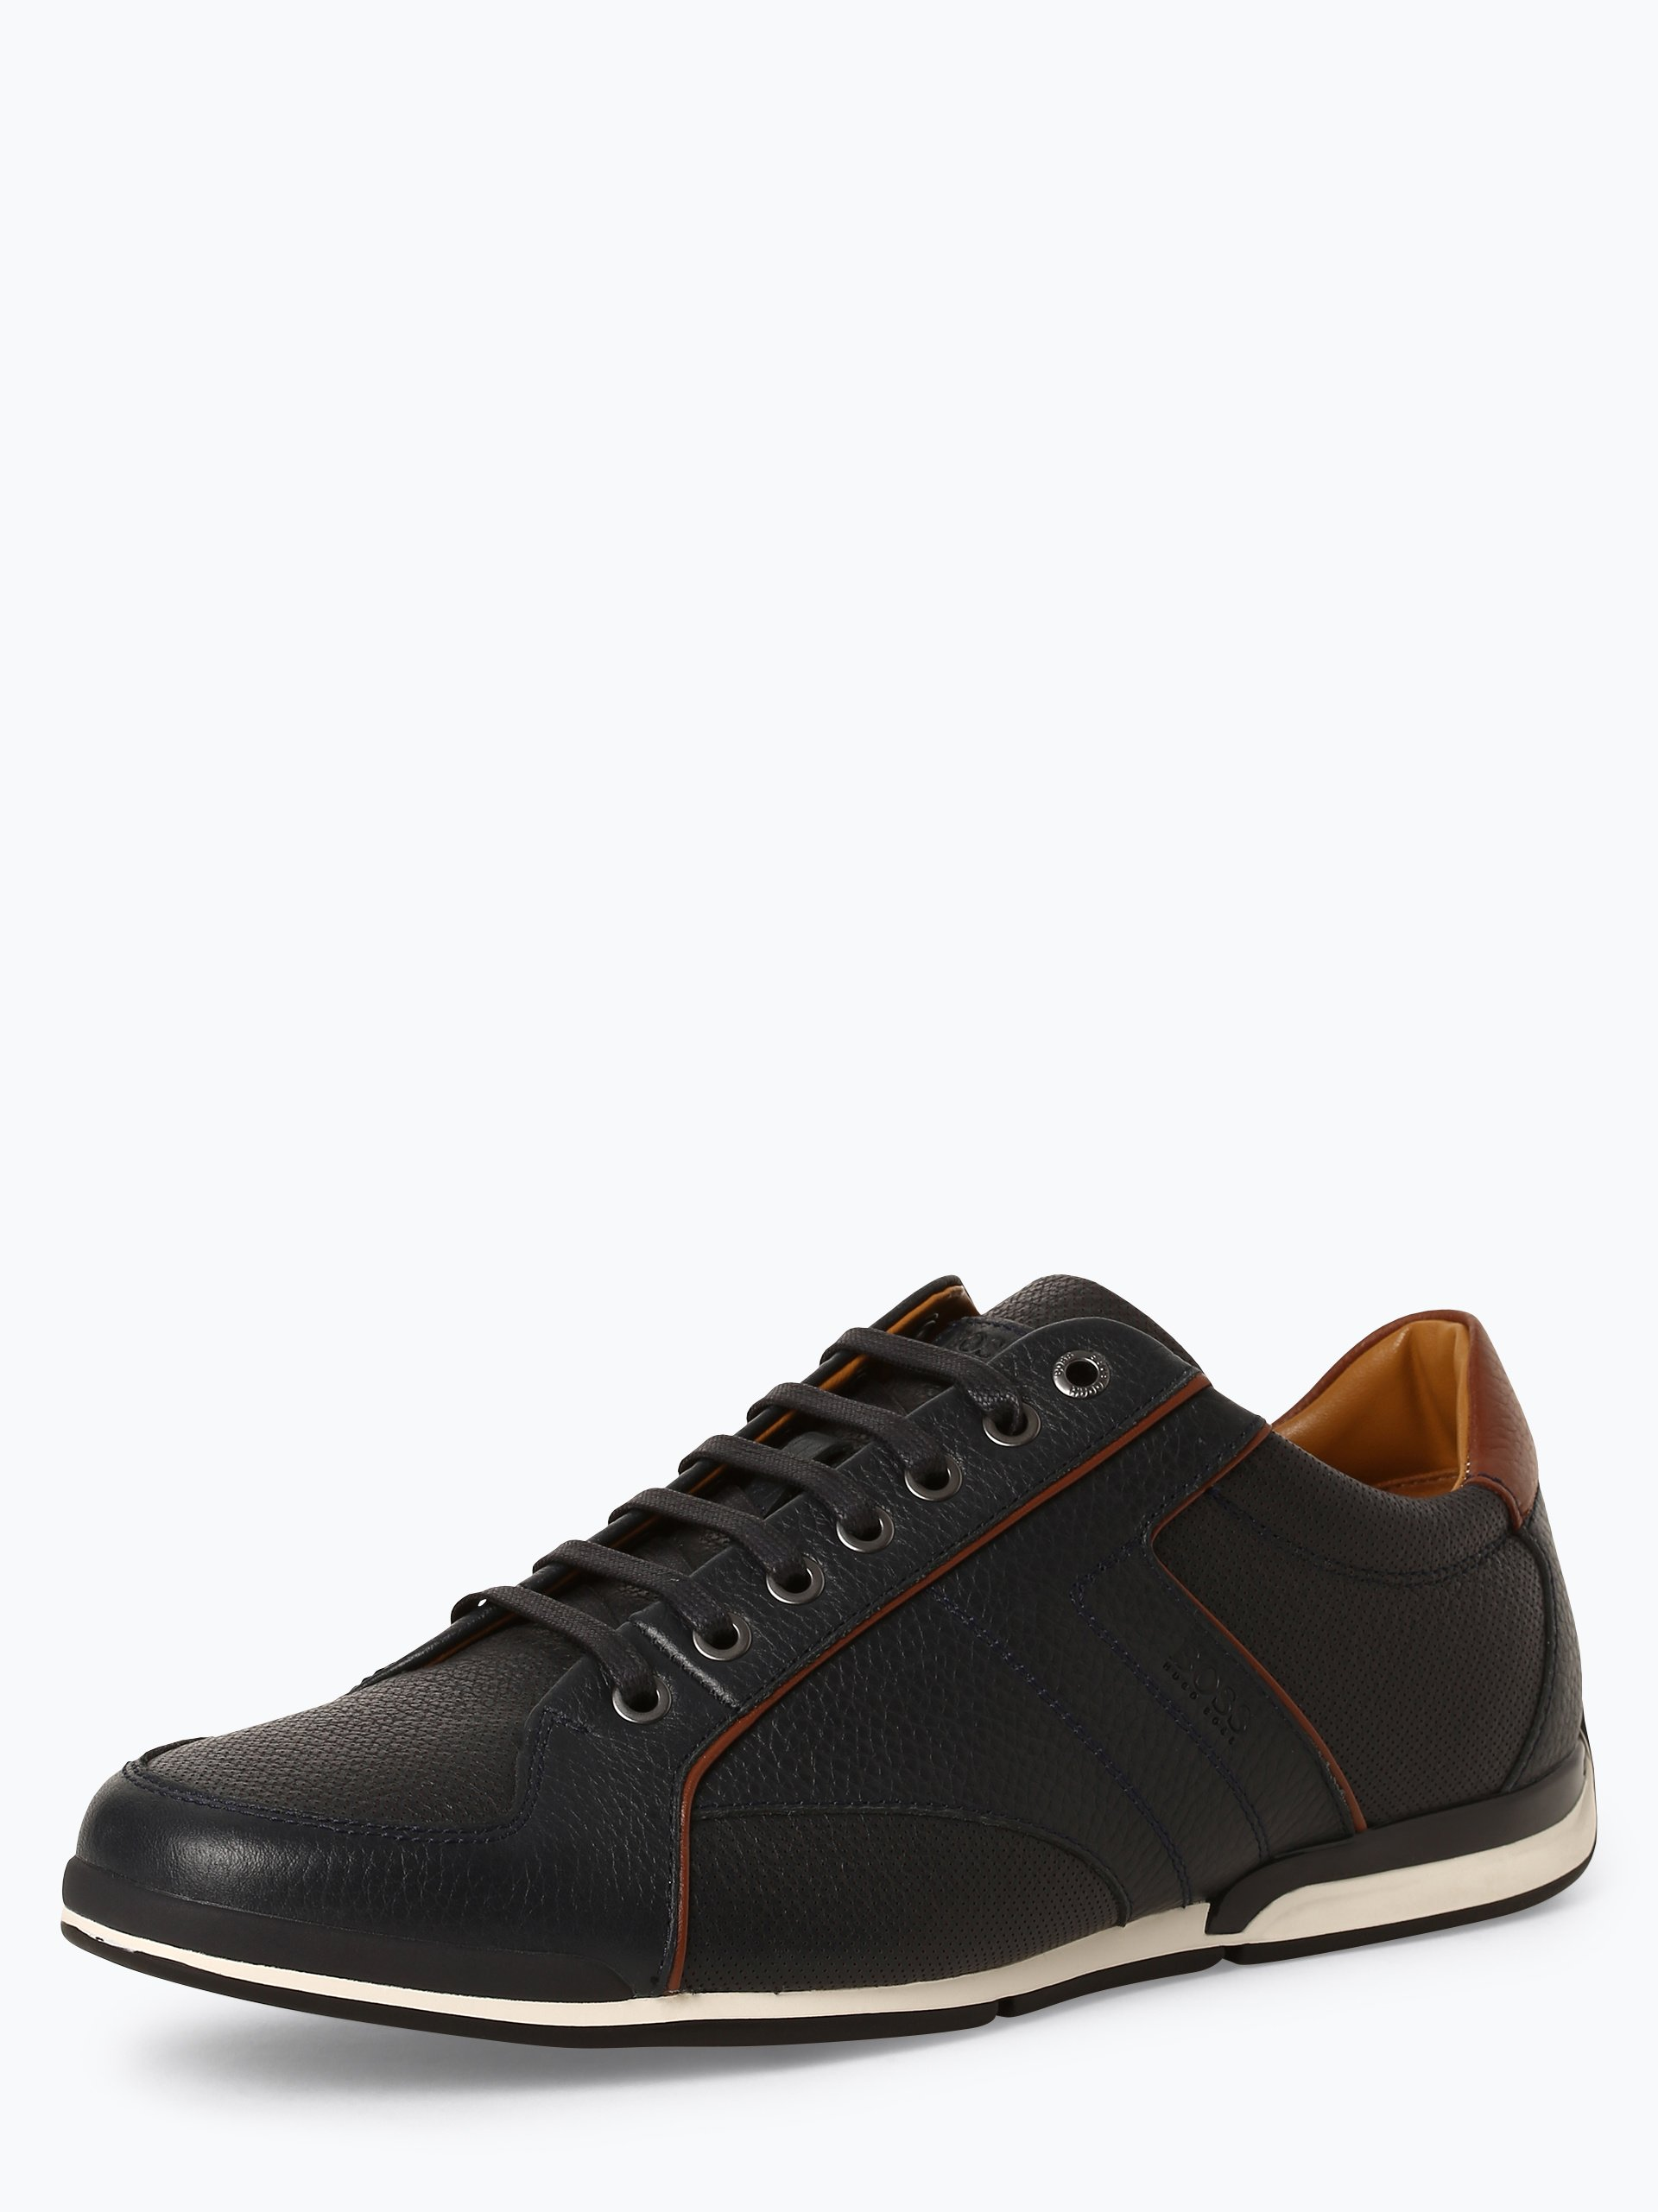 BOSS Casual Herren Sneaker aus Leder - Saturn_lowp_tbpf